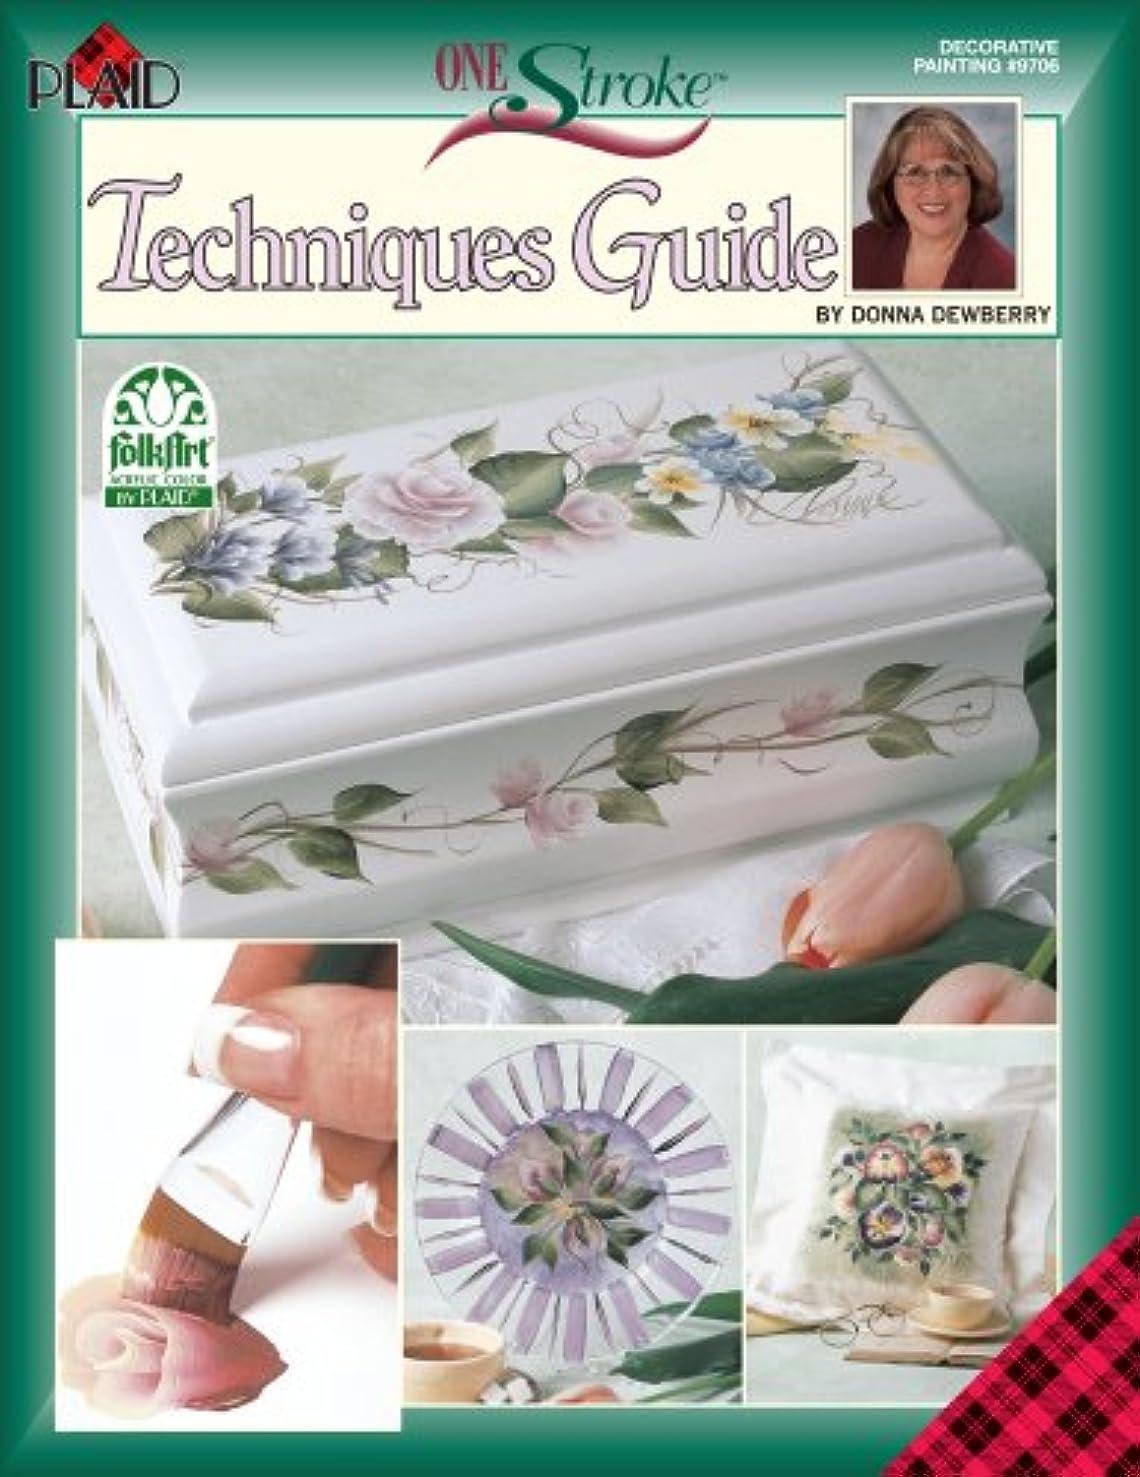 One Stroke Technique Book, 9706 Decorative Painting